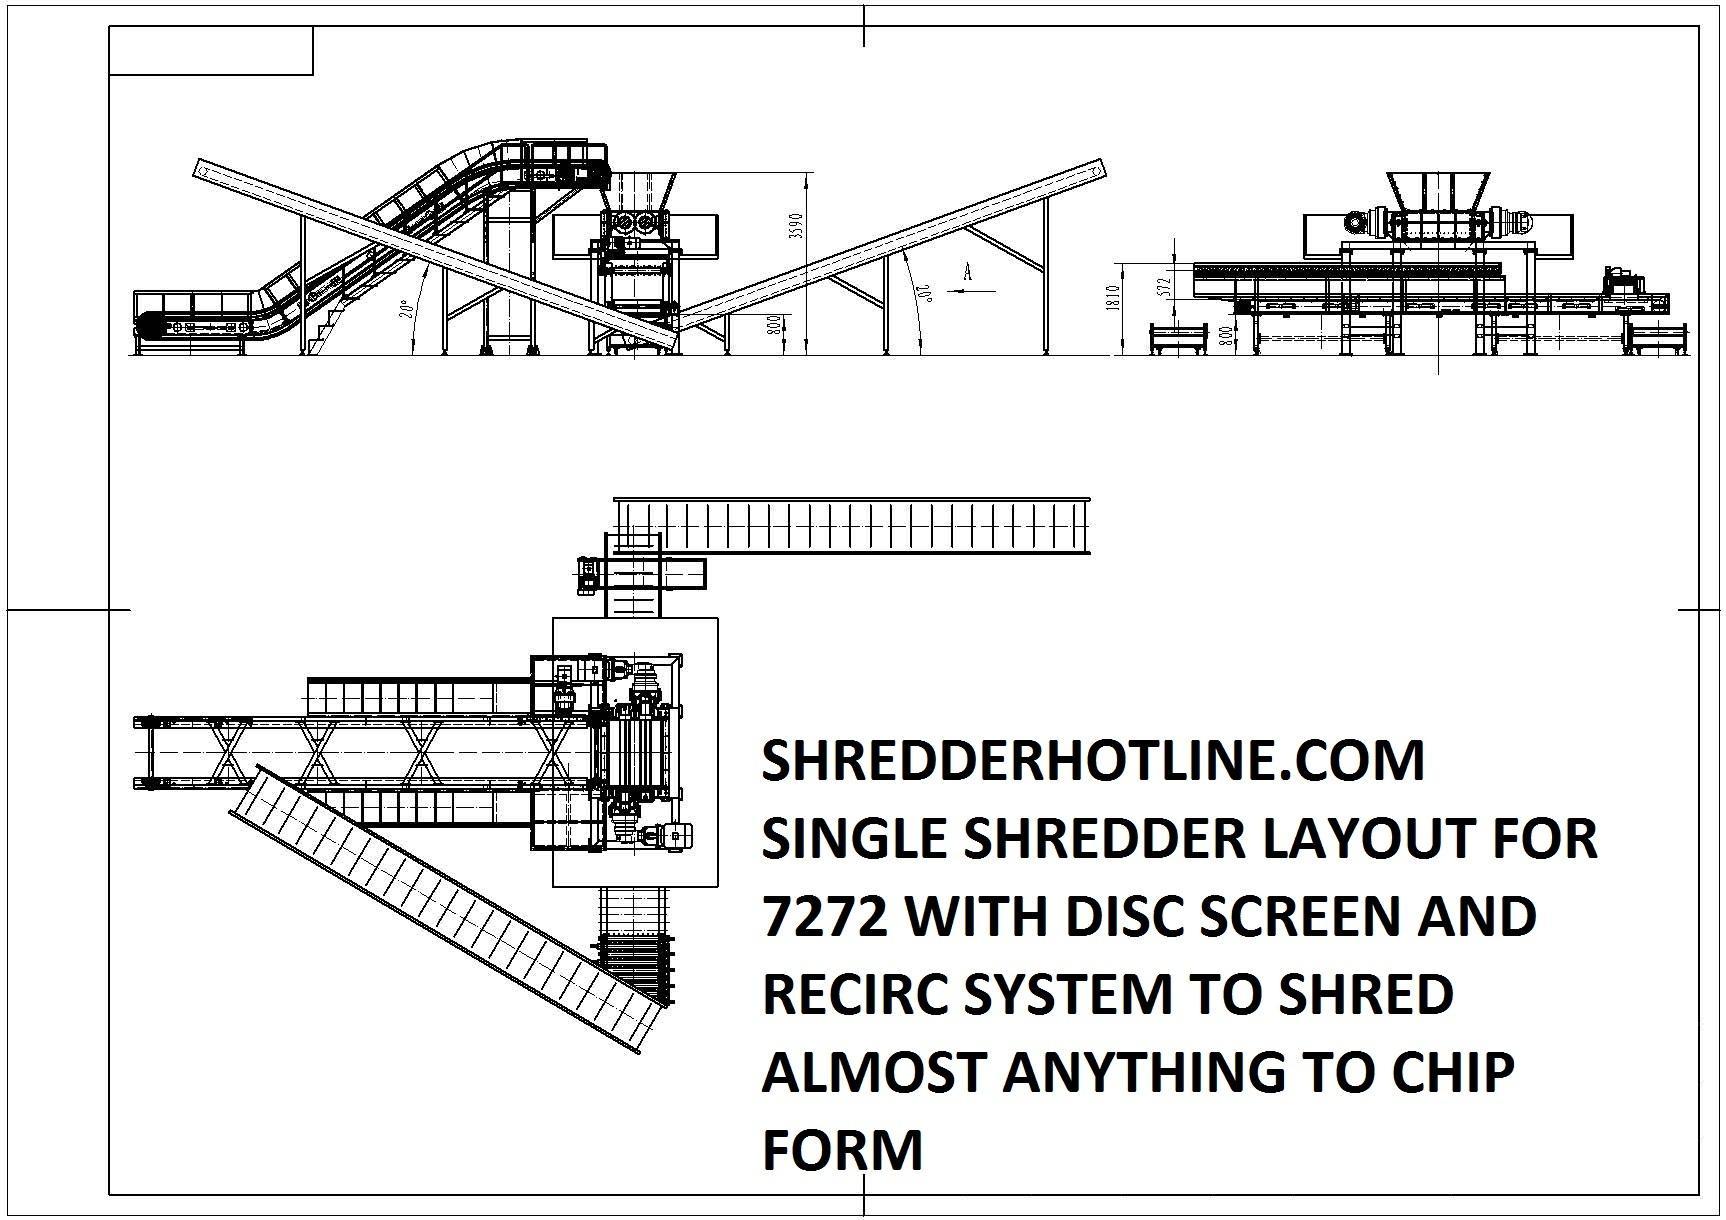 shredderhotline company inc.